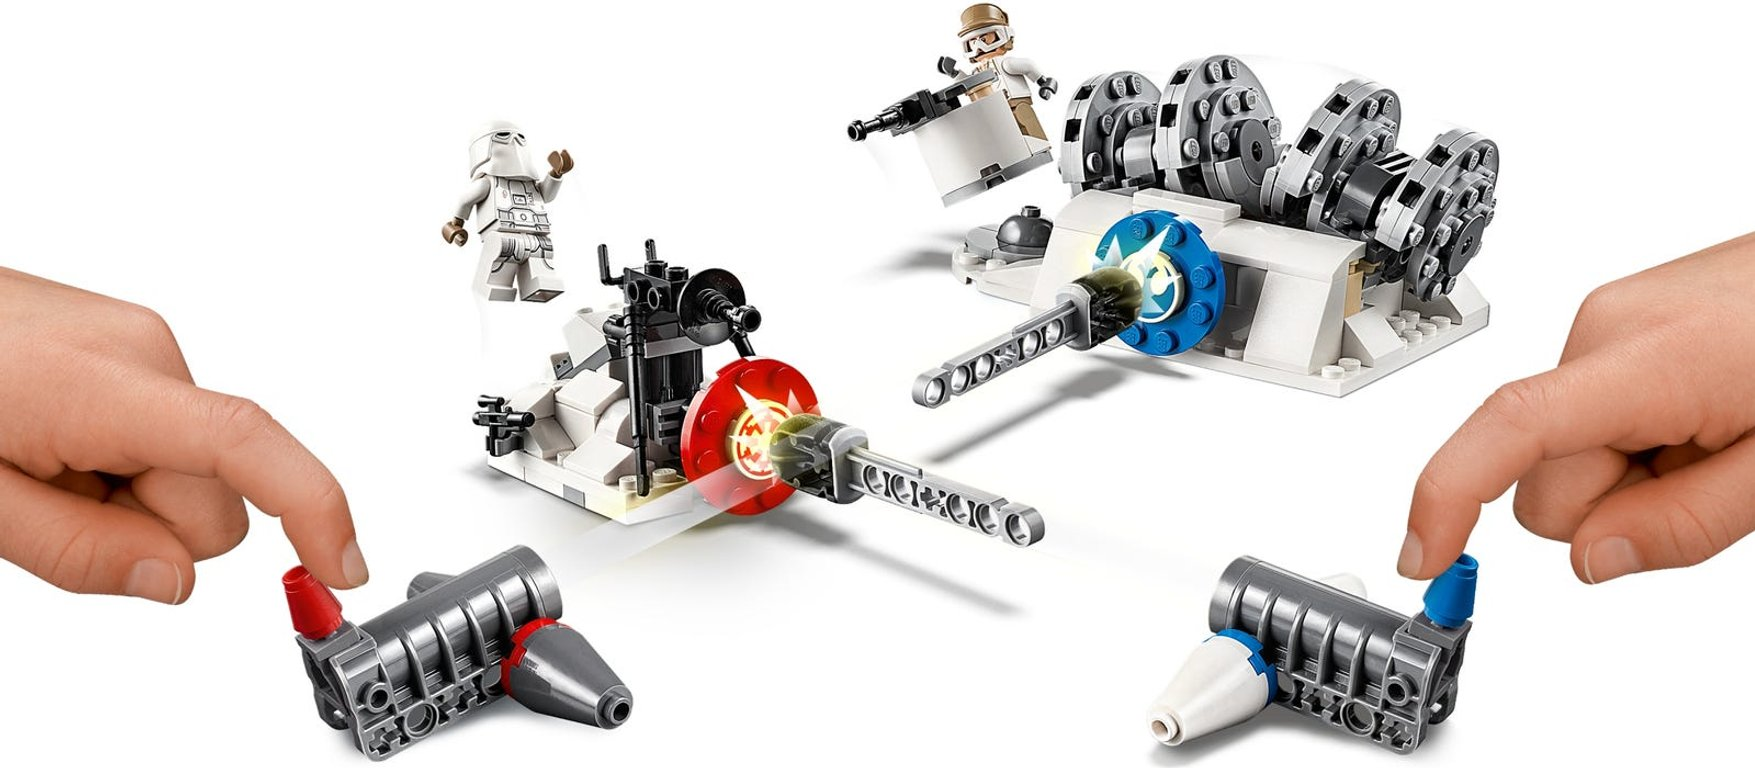 LEGO® Star Wars Action Battle Hoth™ Generator Attack gameplay